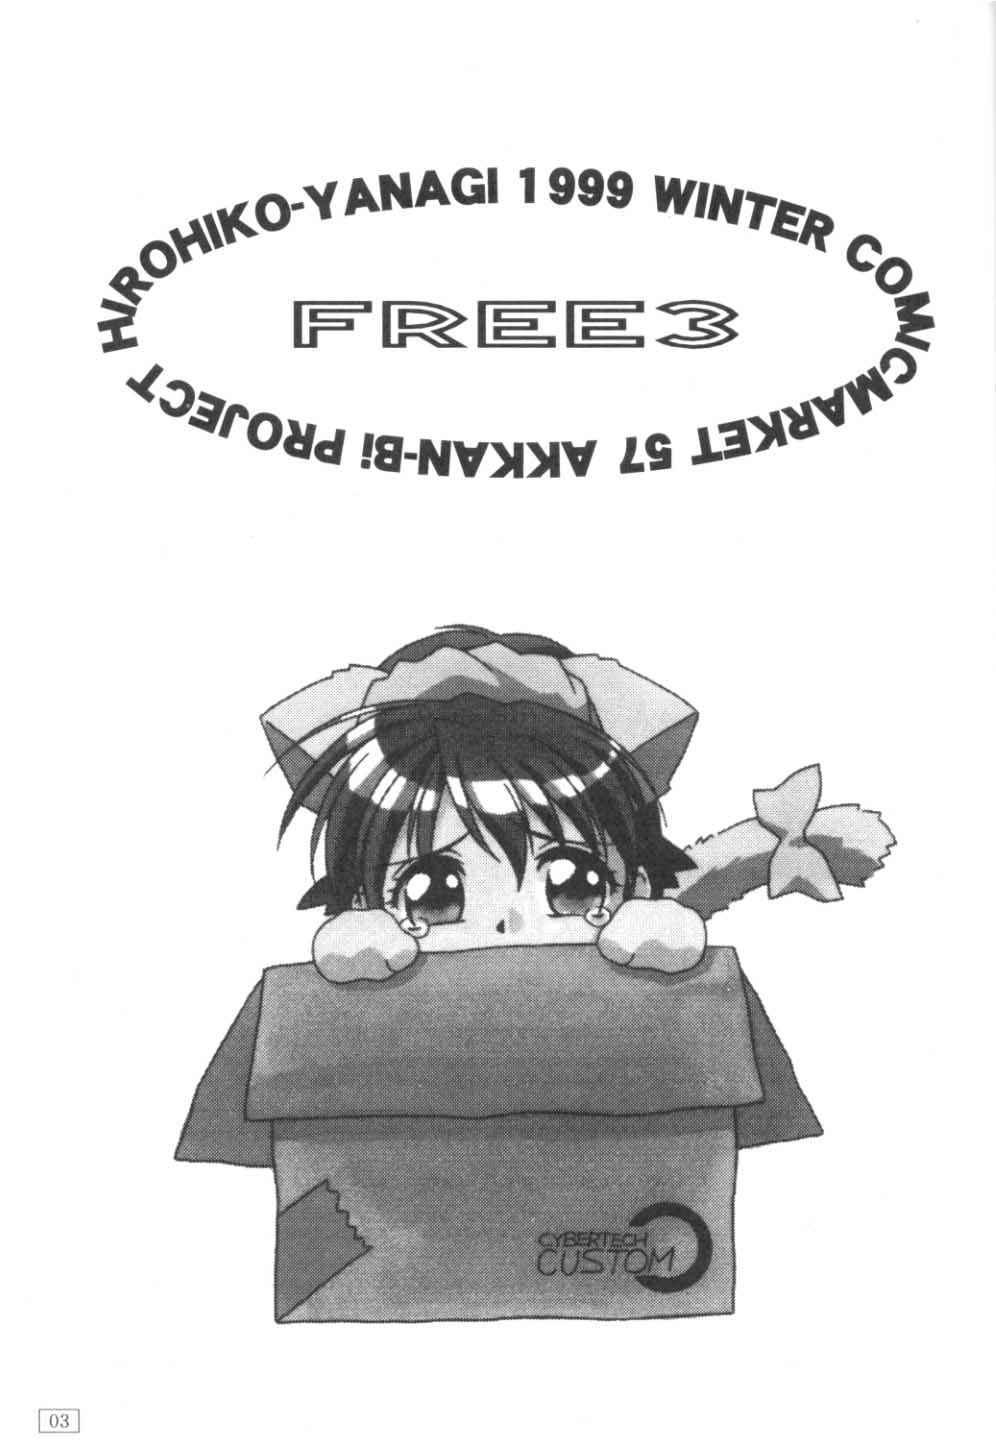 Hirohiko Yanagi - Free3 1